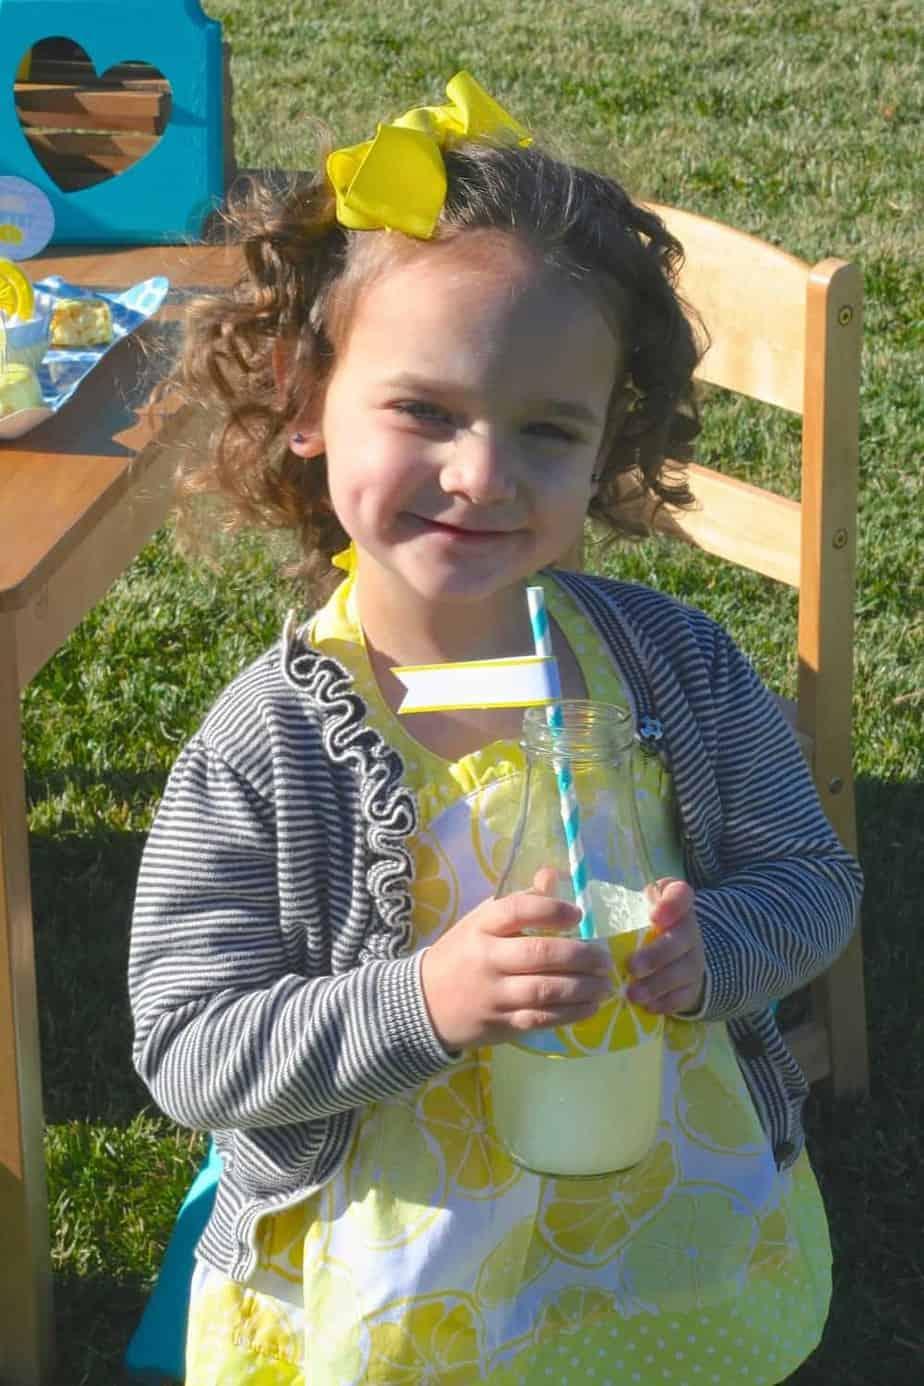 Lemonade Party Emmas Old Fashioned Lemonade Stand  Mimi